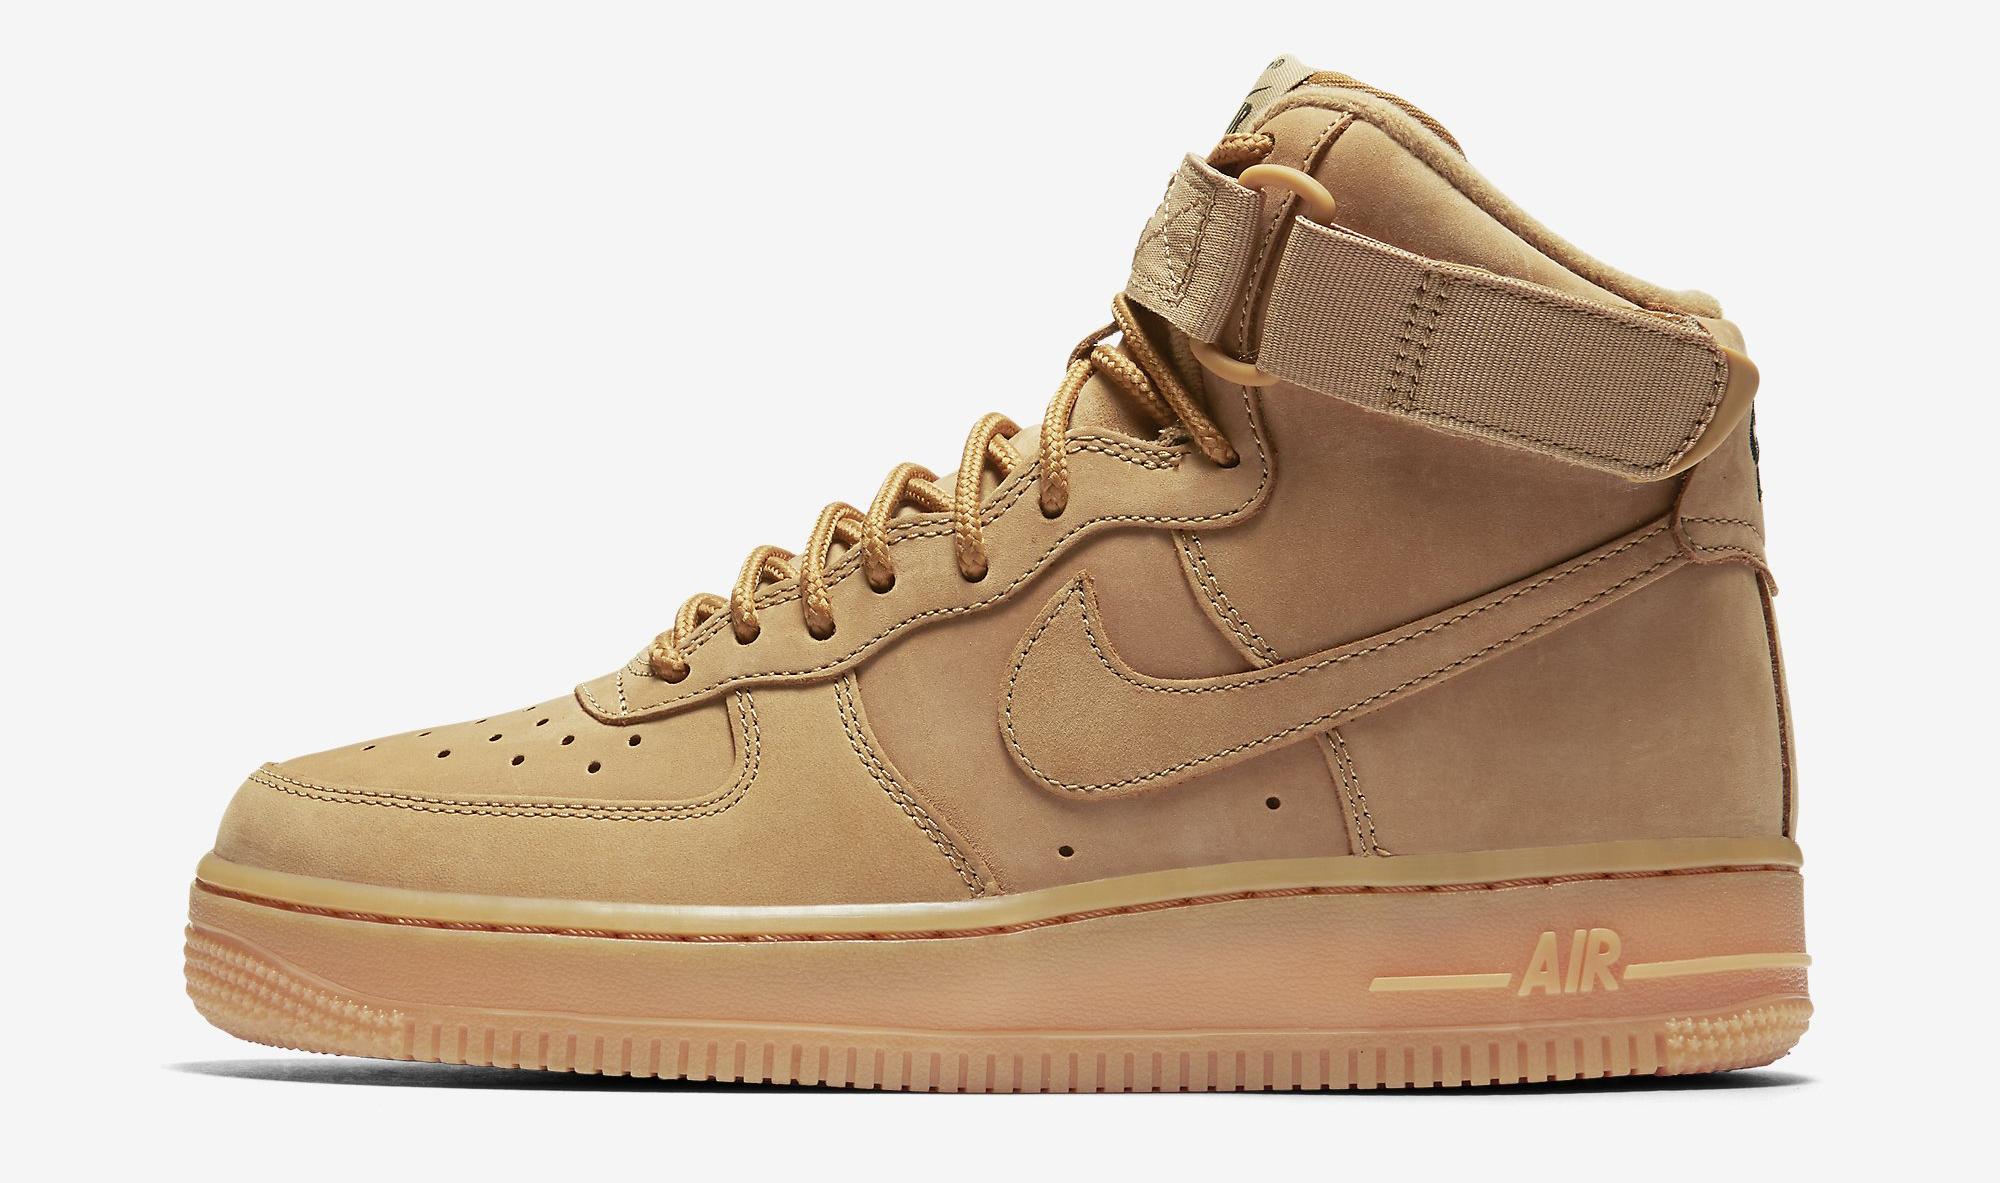 Wheat Nike Air Force 1 654440-200 Profile